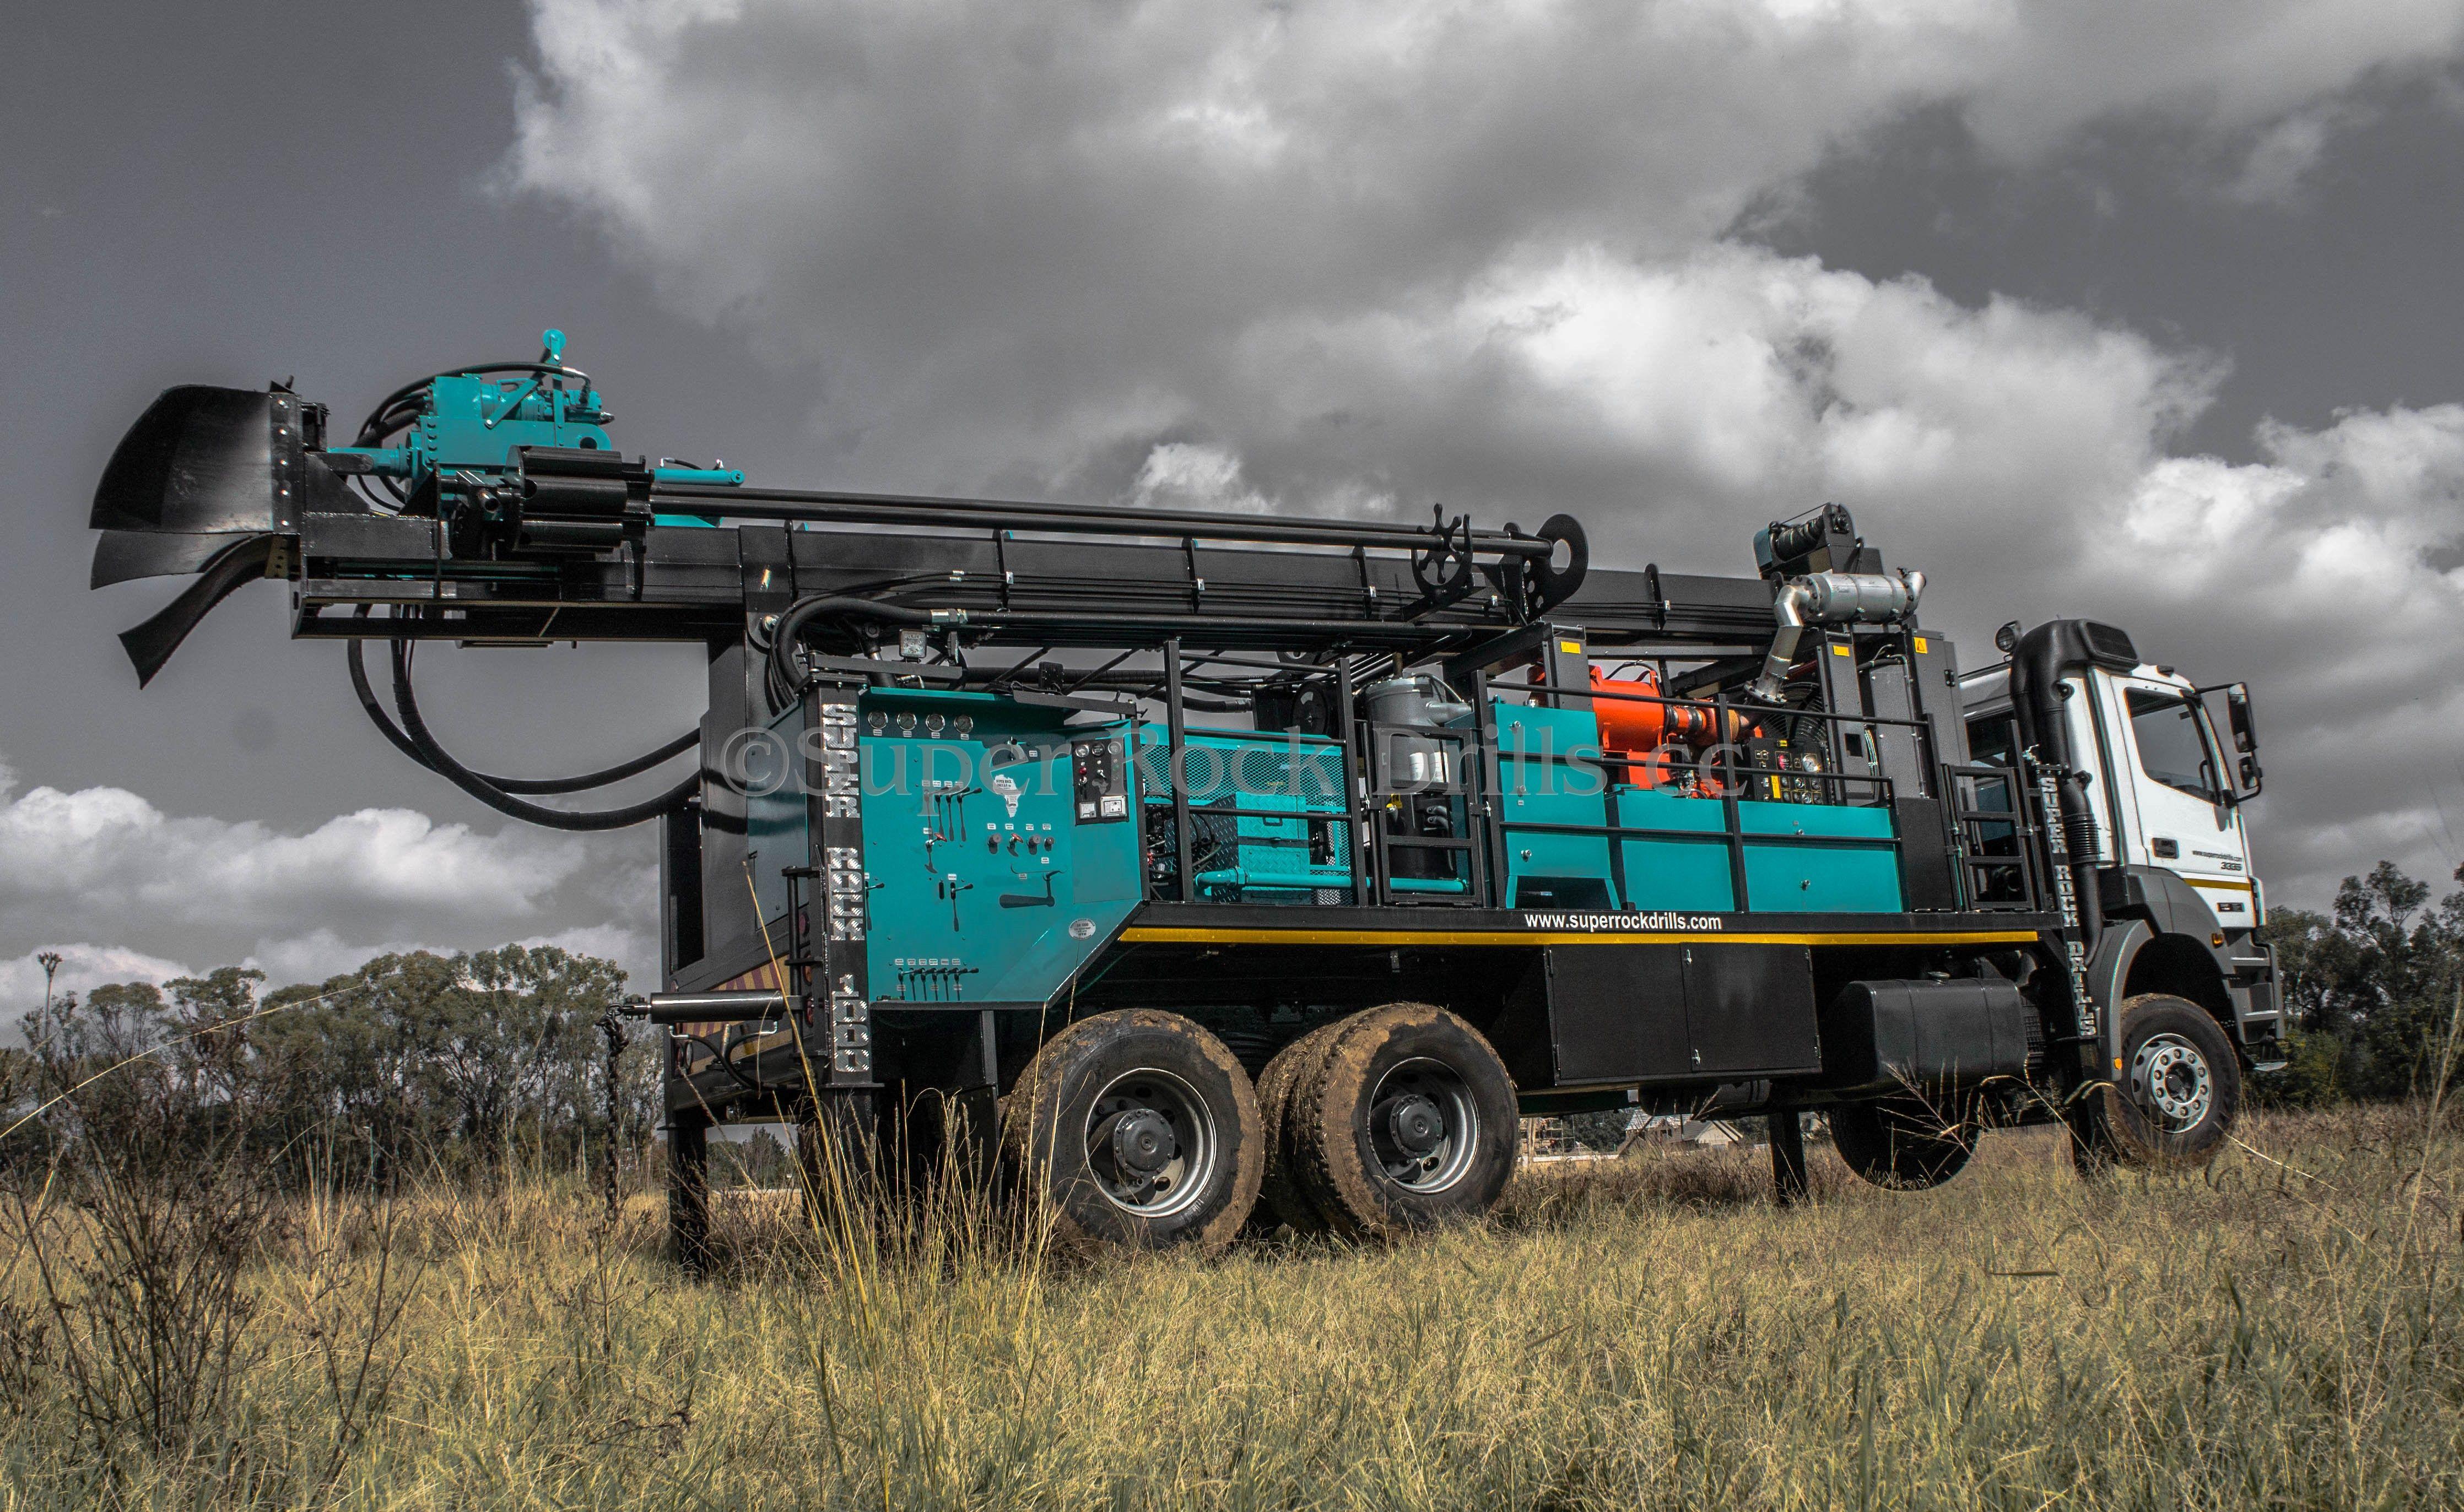 A Super Rock 1000 Waterwell drill rig c/w Atlas Copco